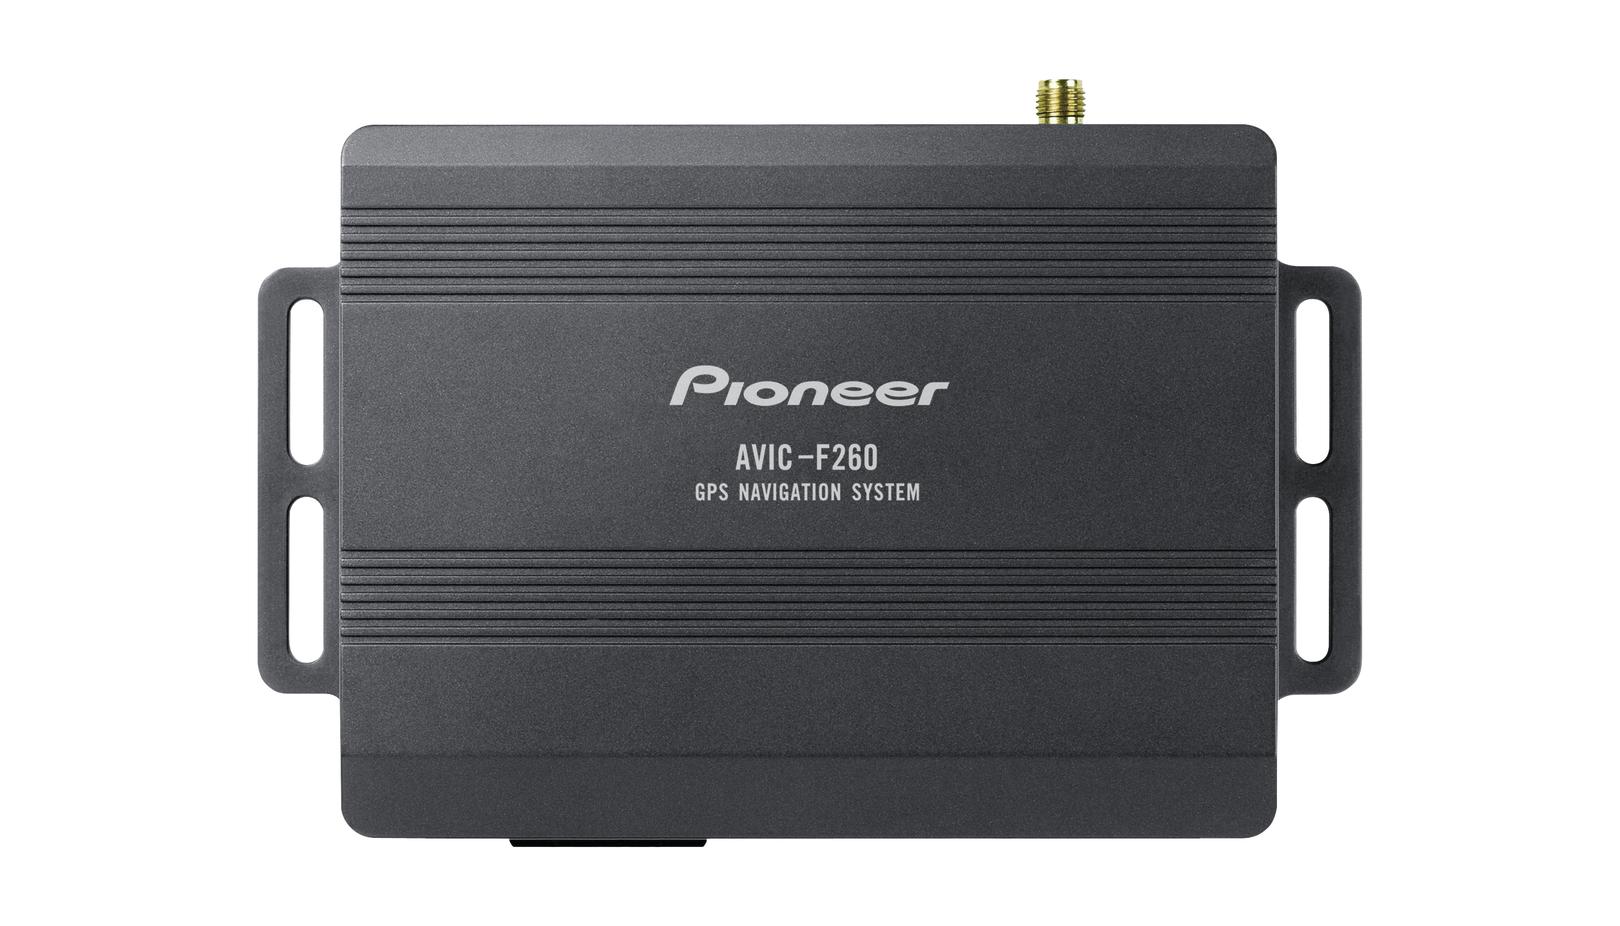 pioneer avh gps add on deh 1600 wiring diagram 2 avic f260 navigation for car av